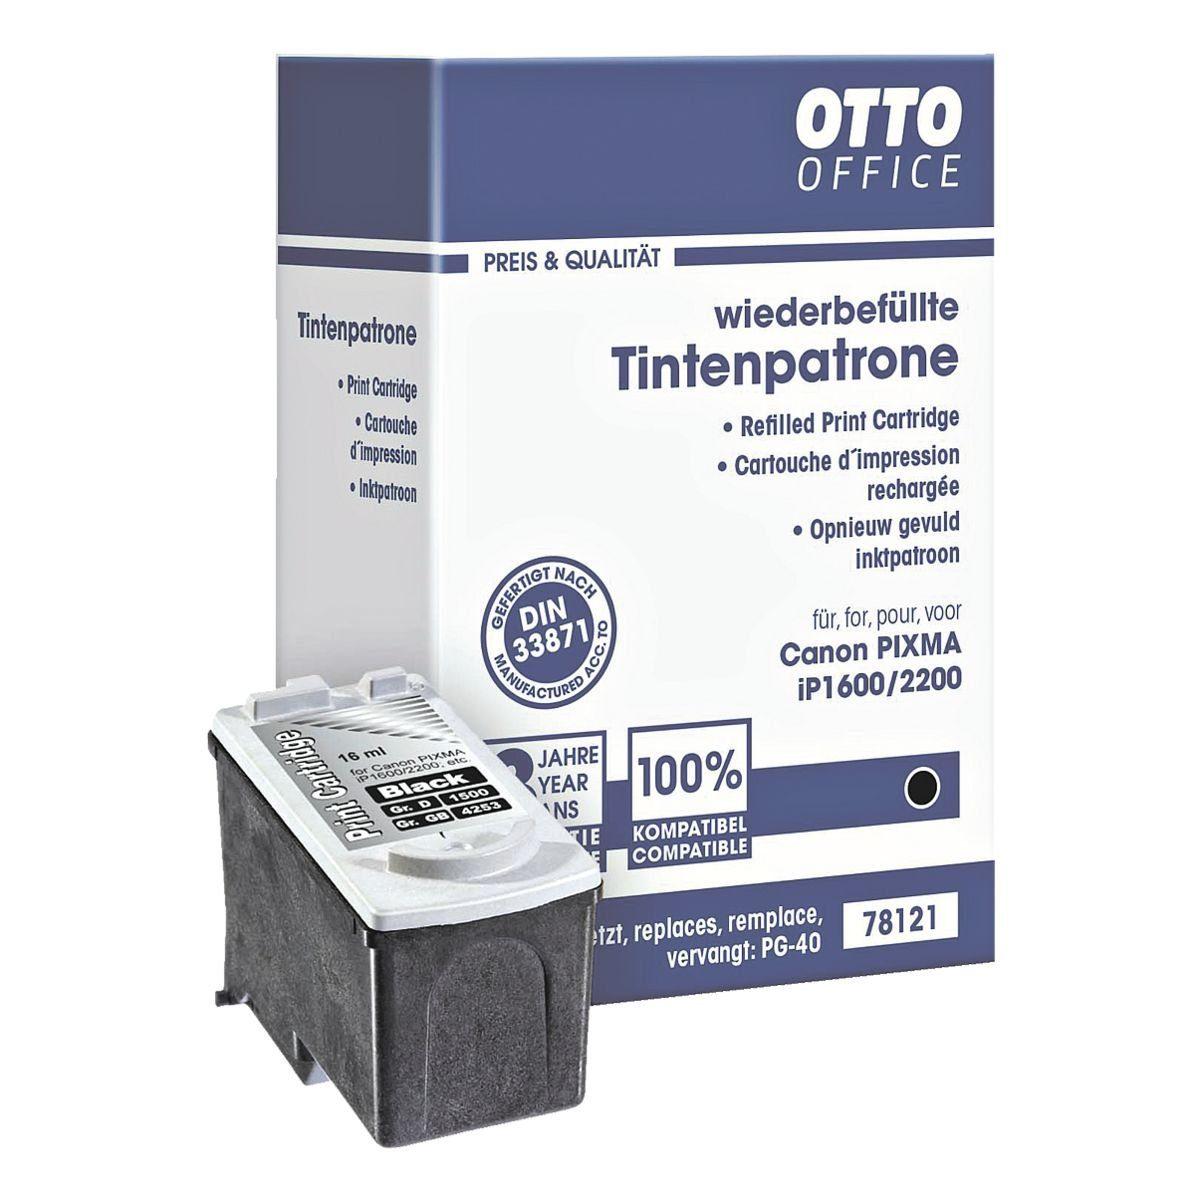 OTTO Office Tintenpatrone ersetzt Canon »PG-40«